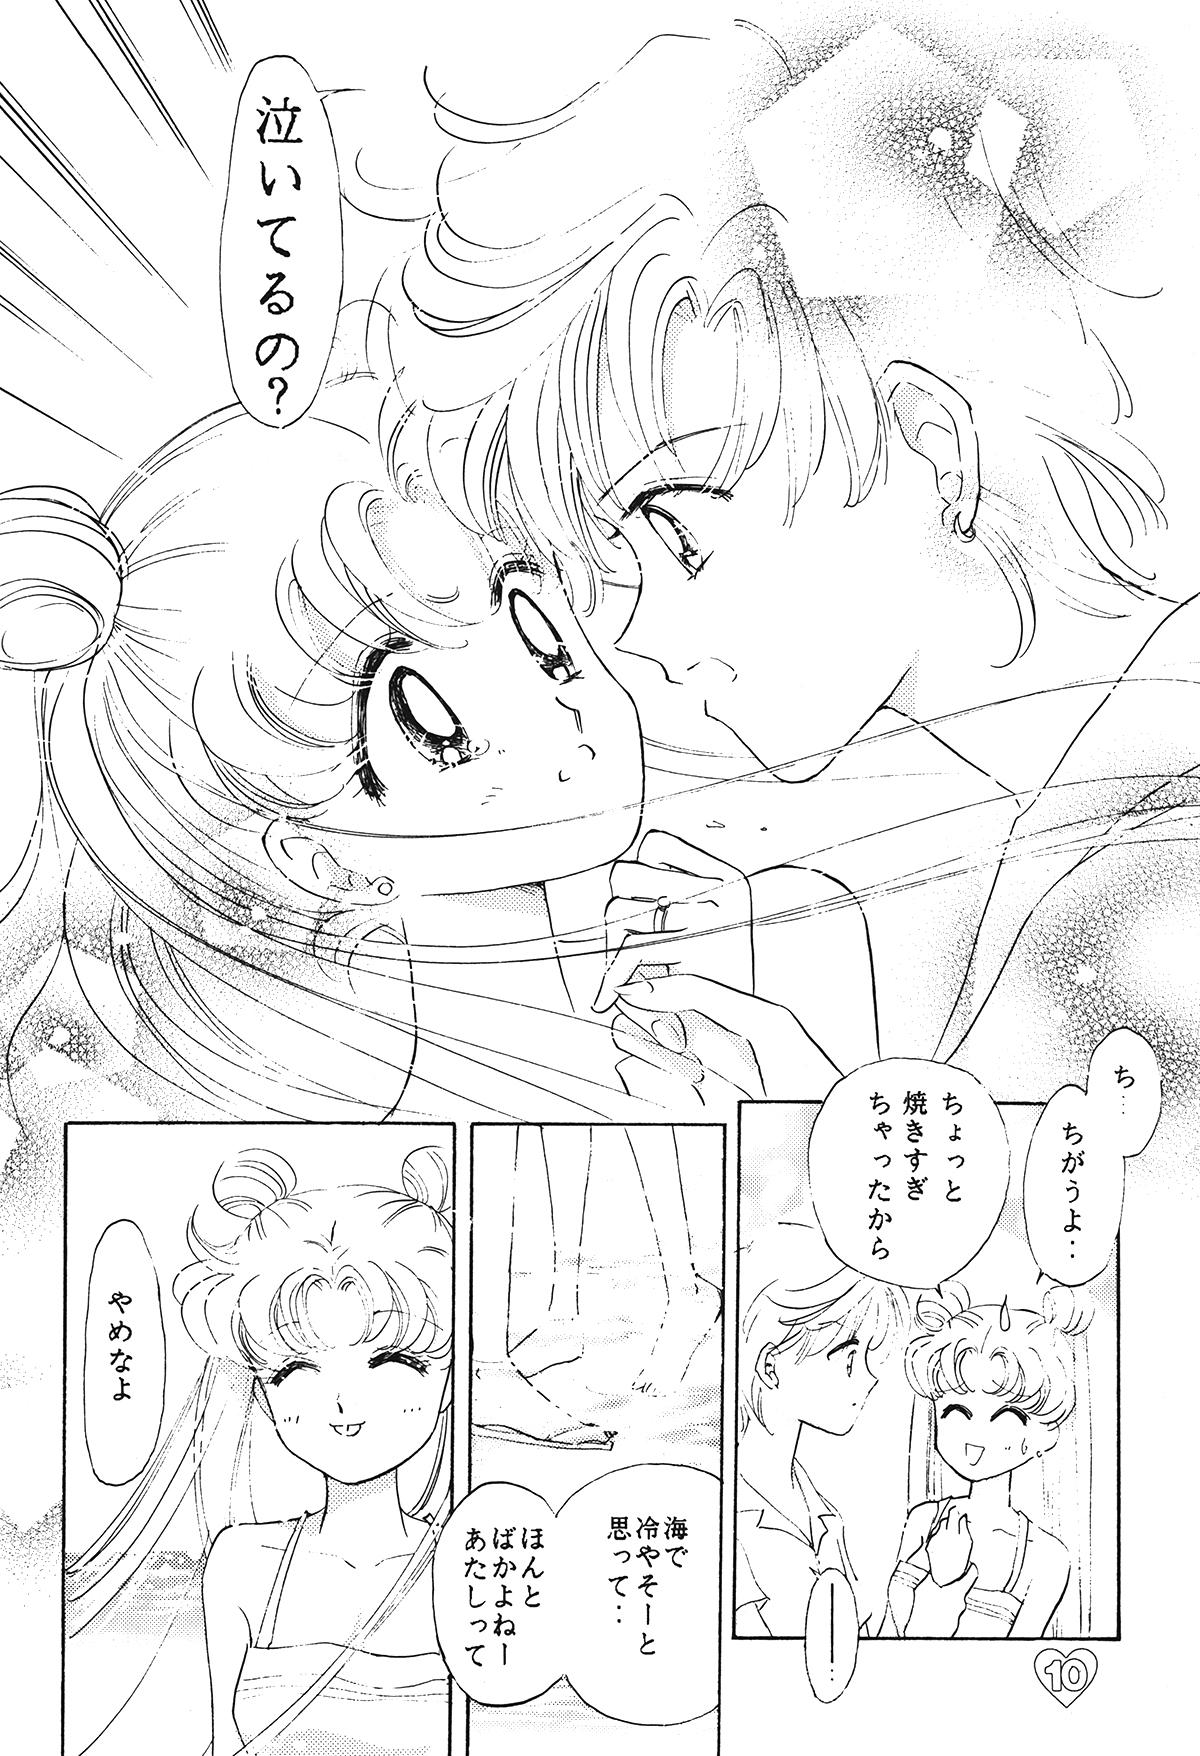 Earth_wind_3_10